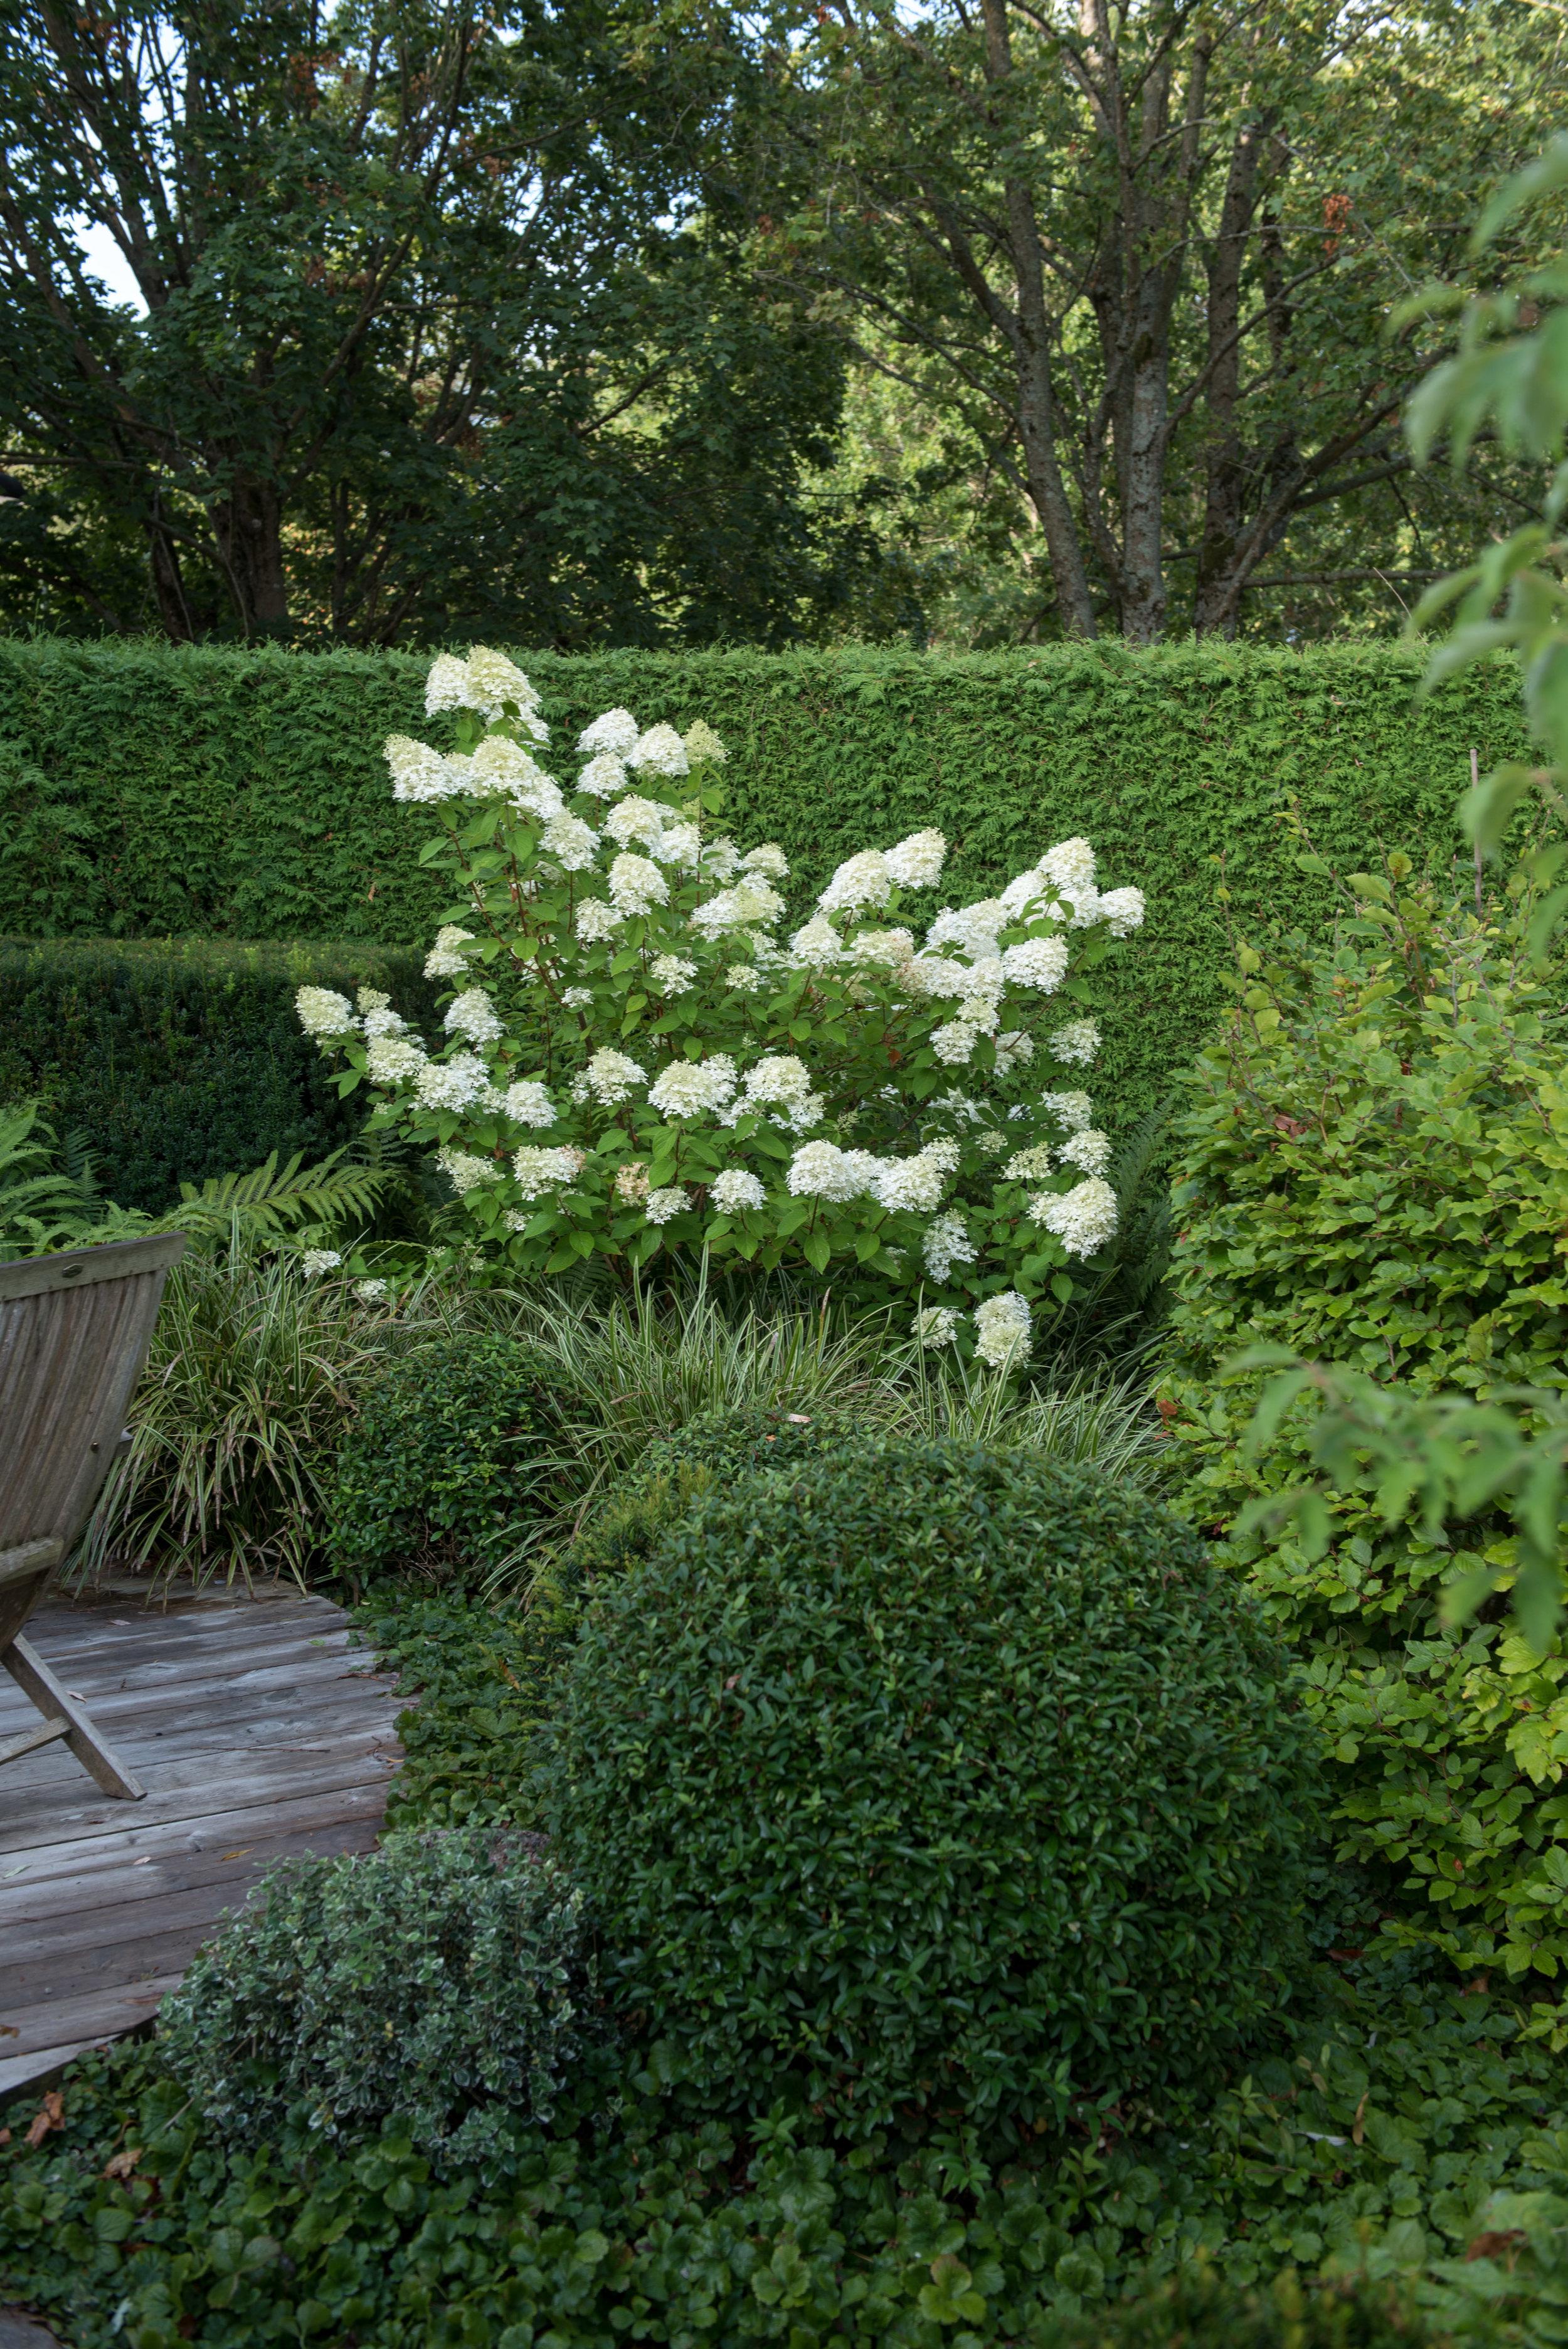 Hydrange paniculata 'Limelight'